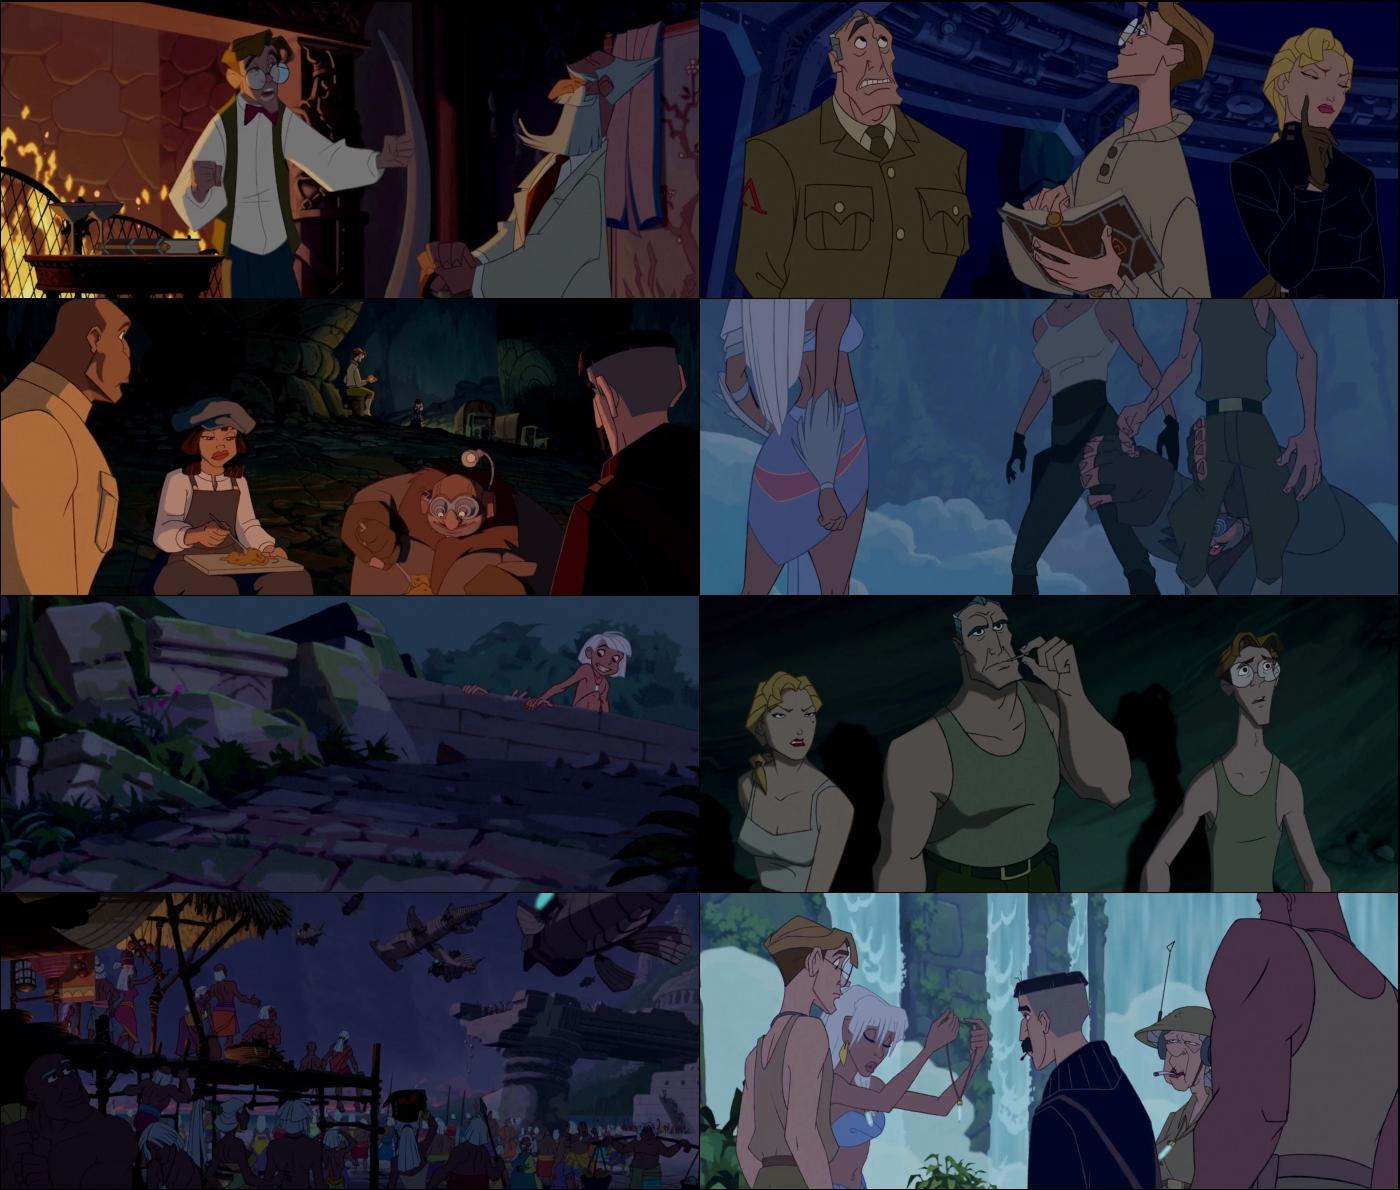 Atlantis El imperio perdido 1080p Latino